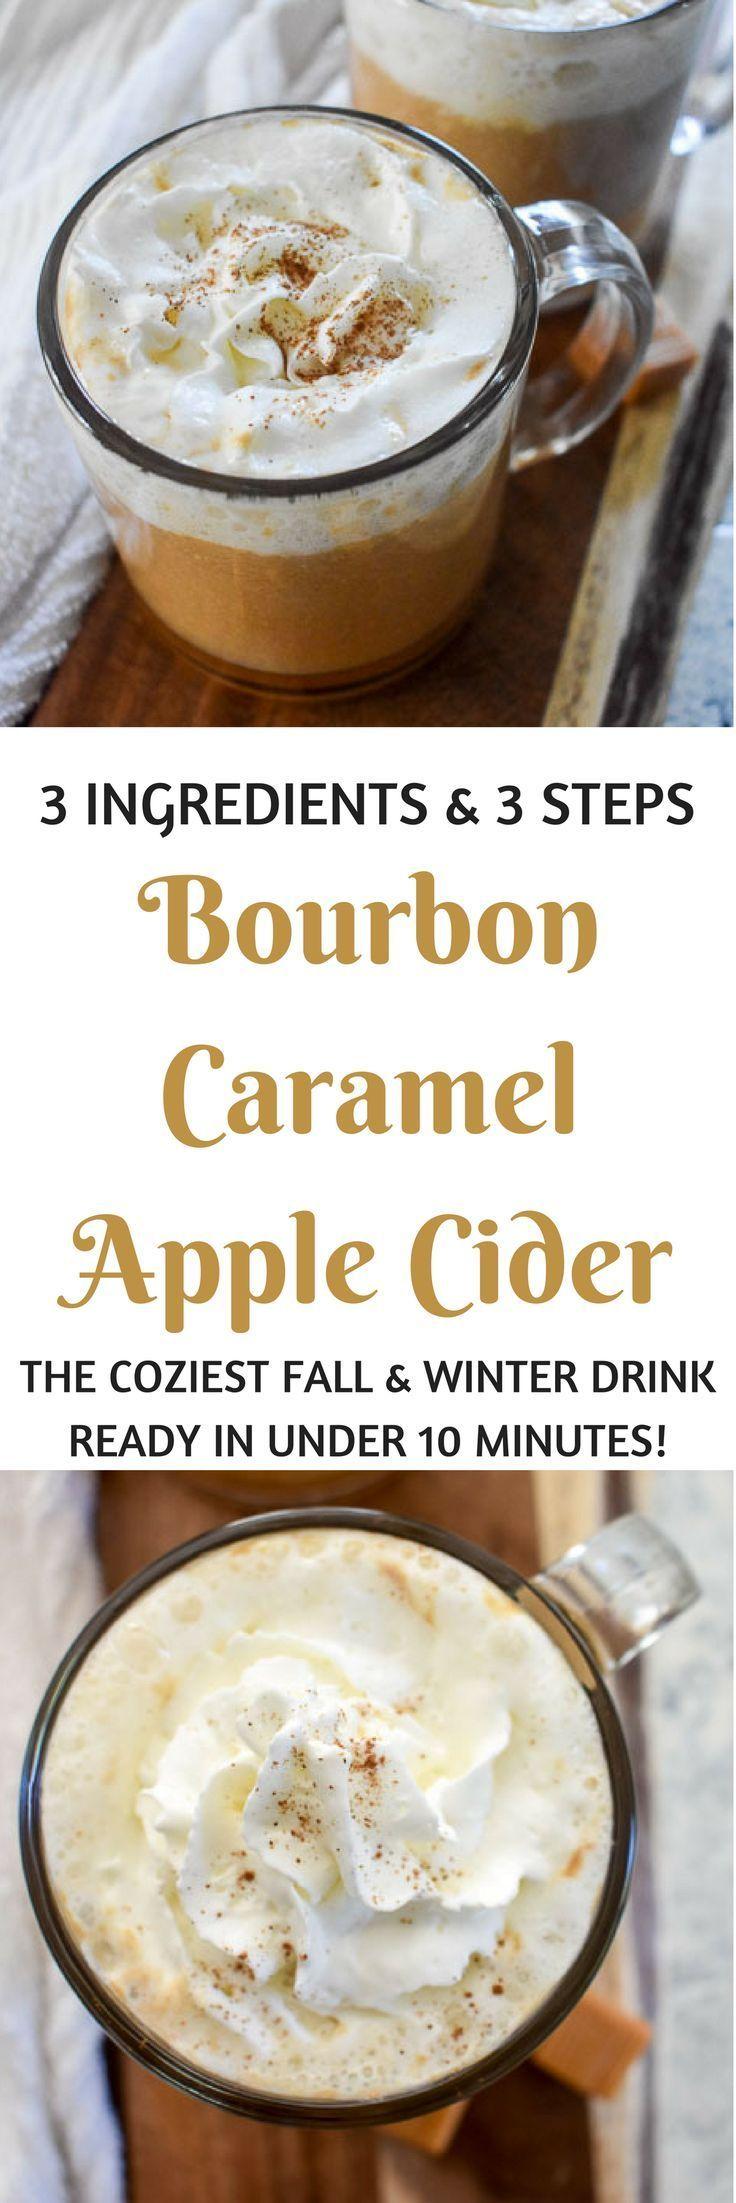 Photo of Bourbon Caramel Apple Cider